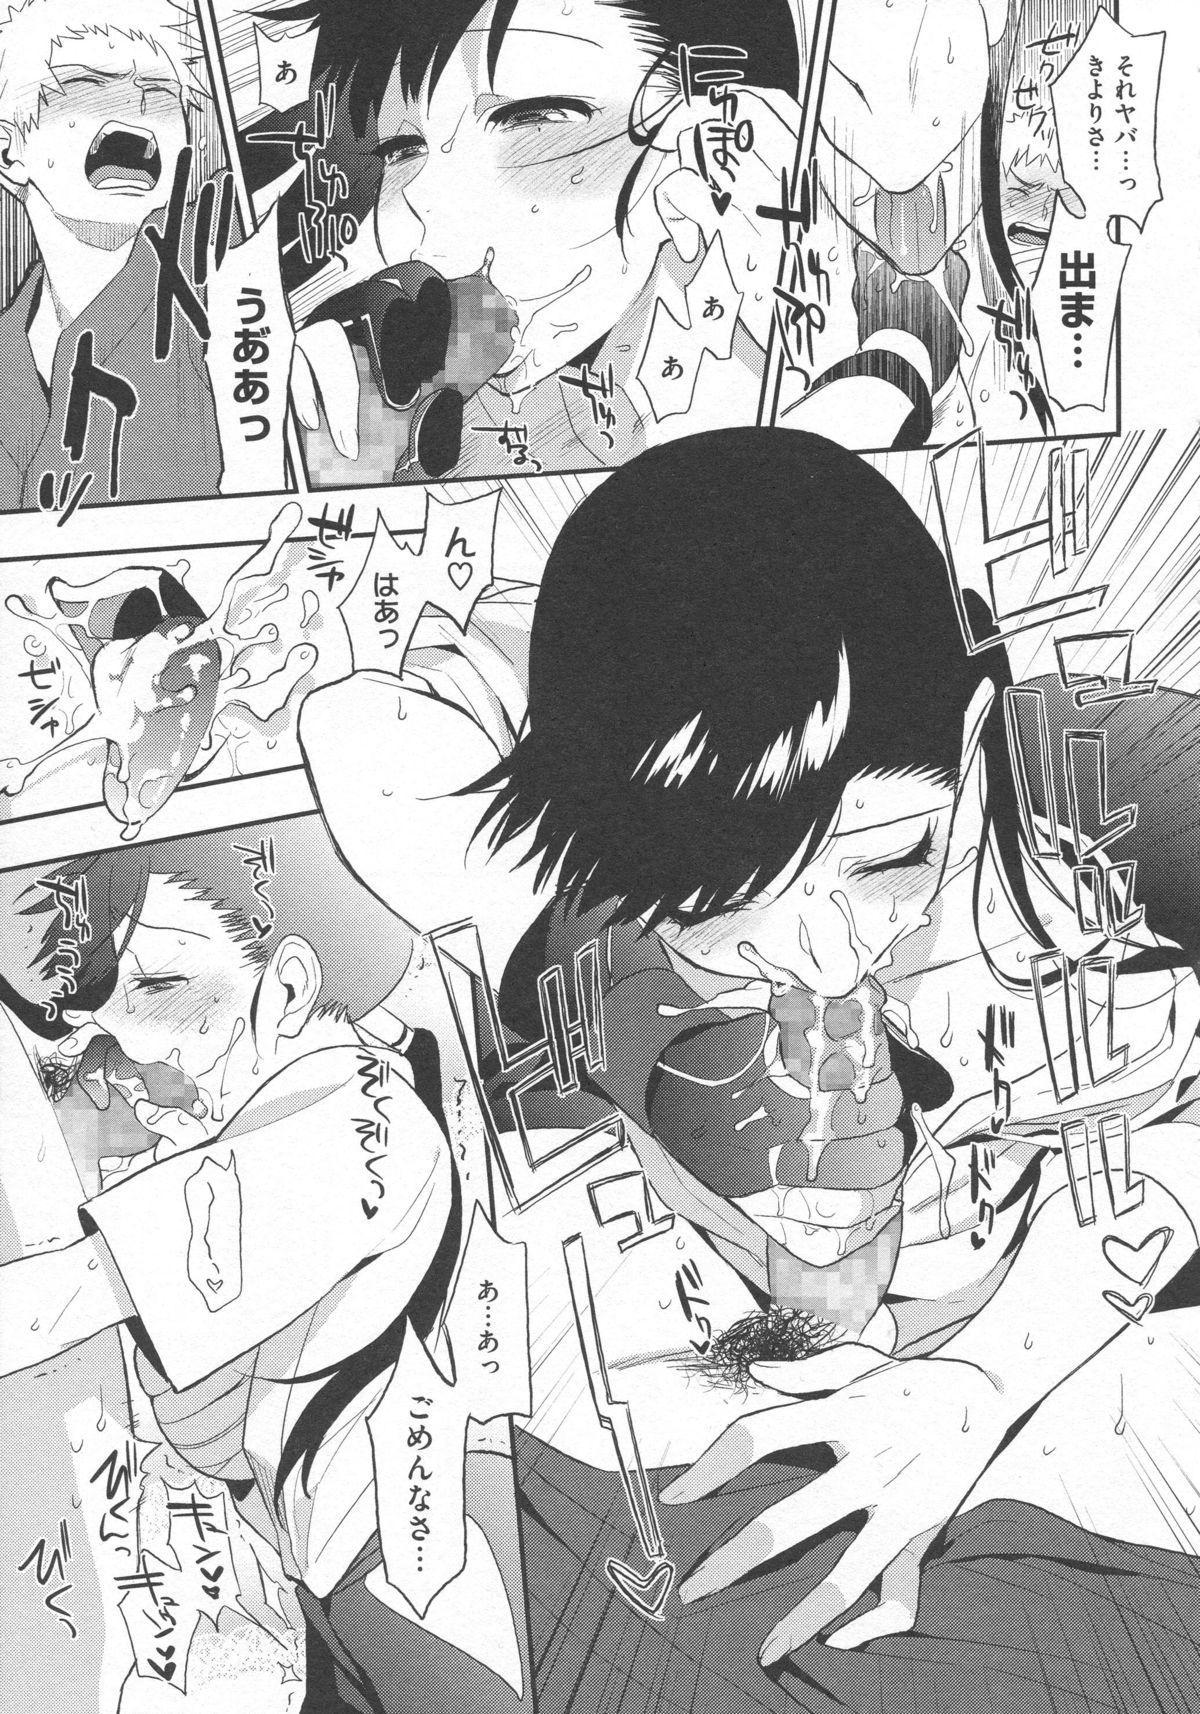 Boku Dake no Yuuyami - Only My Twilight 167